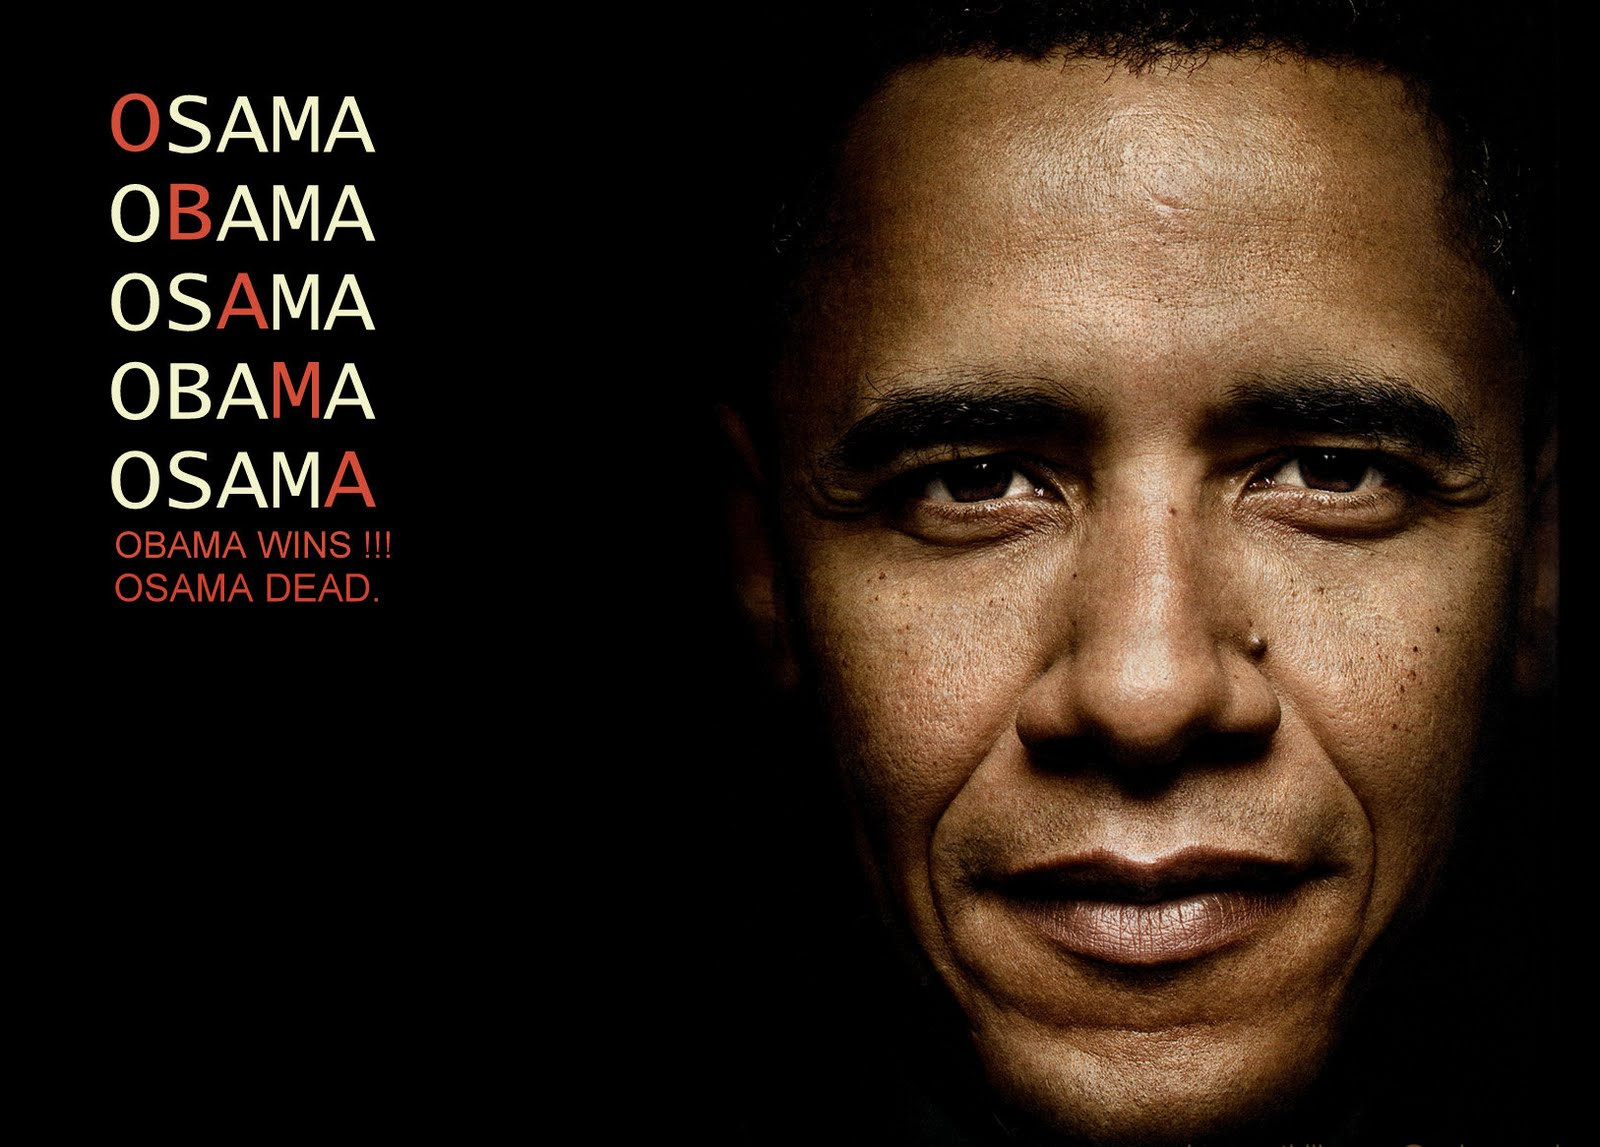 http://3.bp.blogspot.com/-lEnd52vkU10/TcWczQWUUvI/AAAAAAAABFM/NoziKYXGADE/s1600/obama%2Bwins%2Bosama%2BFOR%2BBLOG.jpg